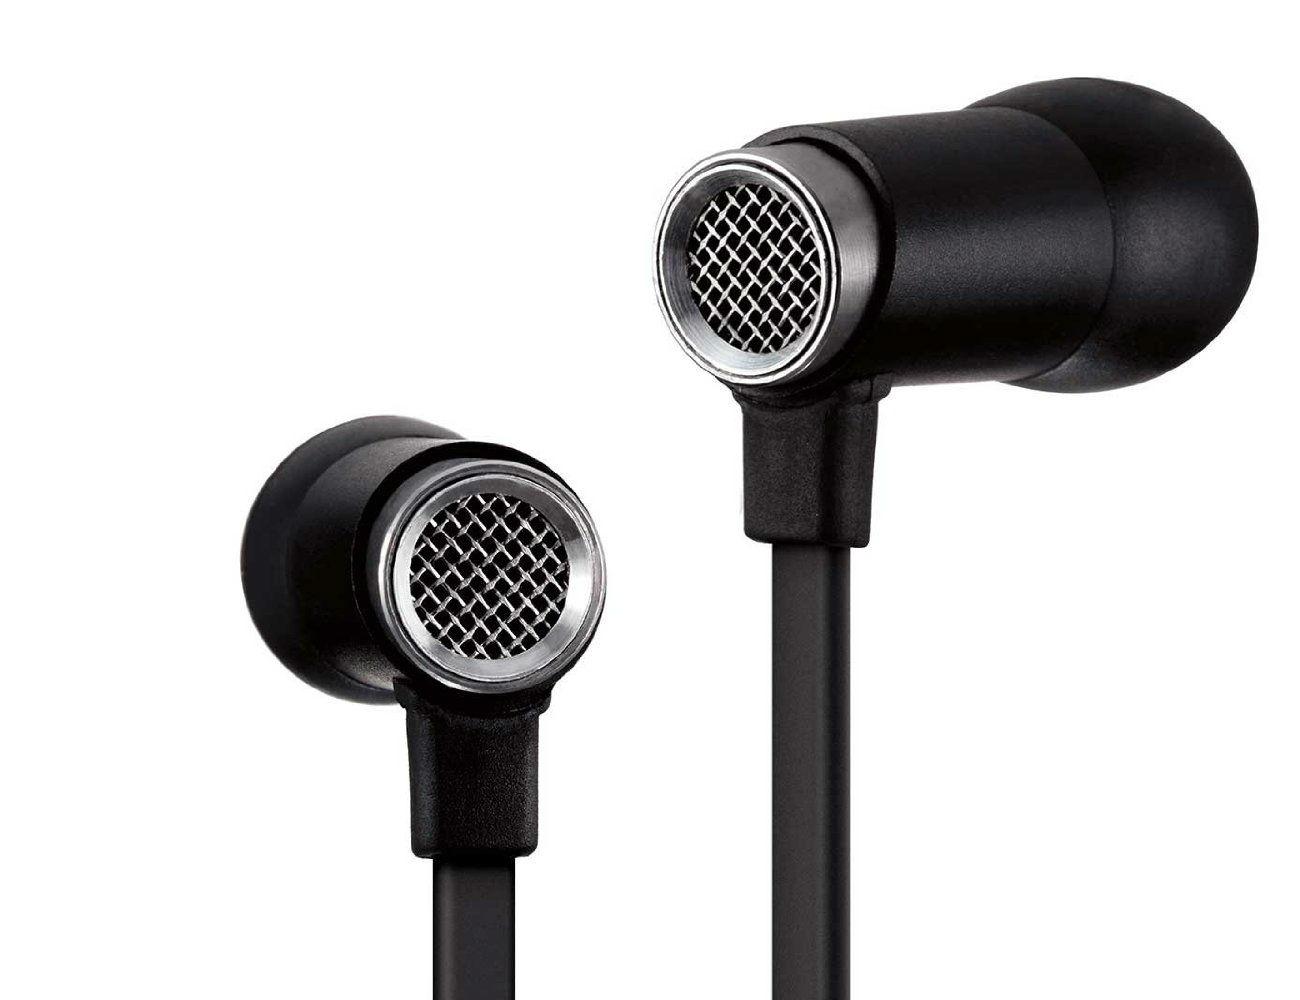 ME03 In-Ear Headphones by Master & Dynamic